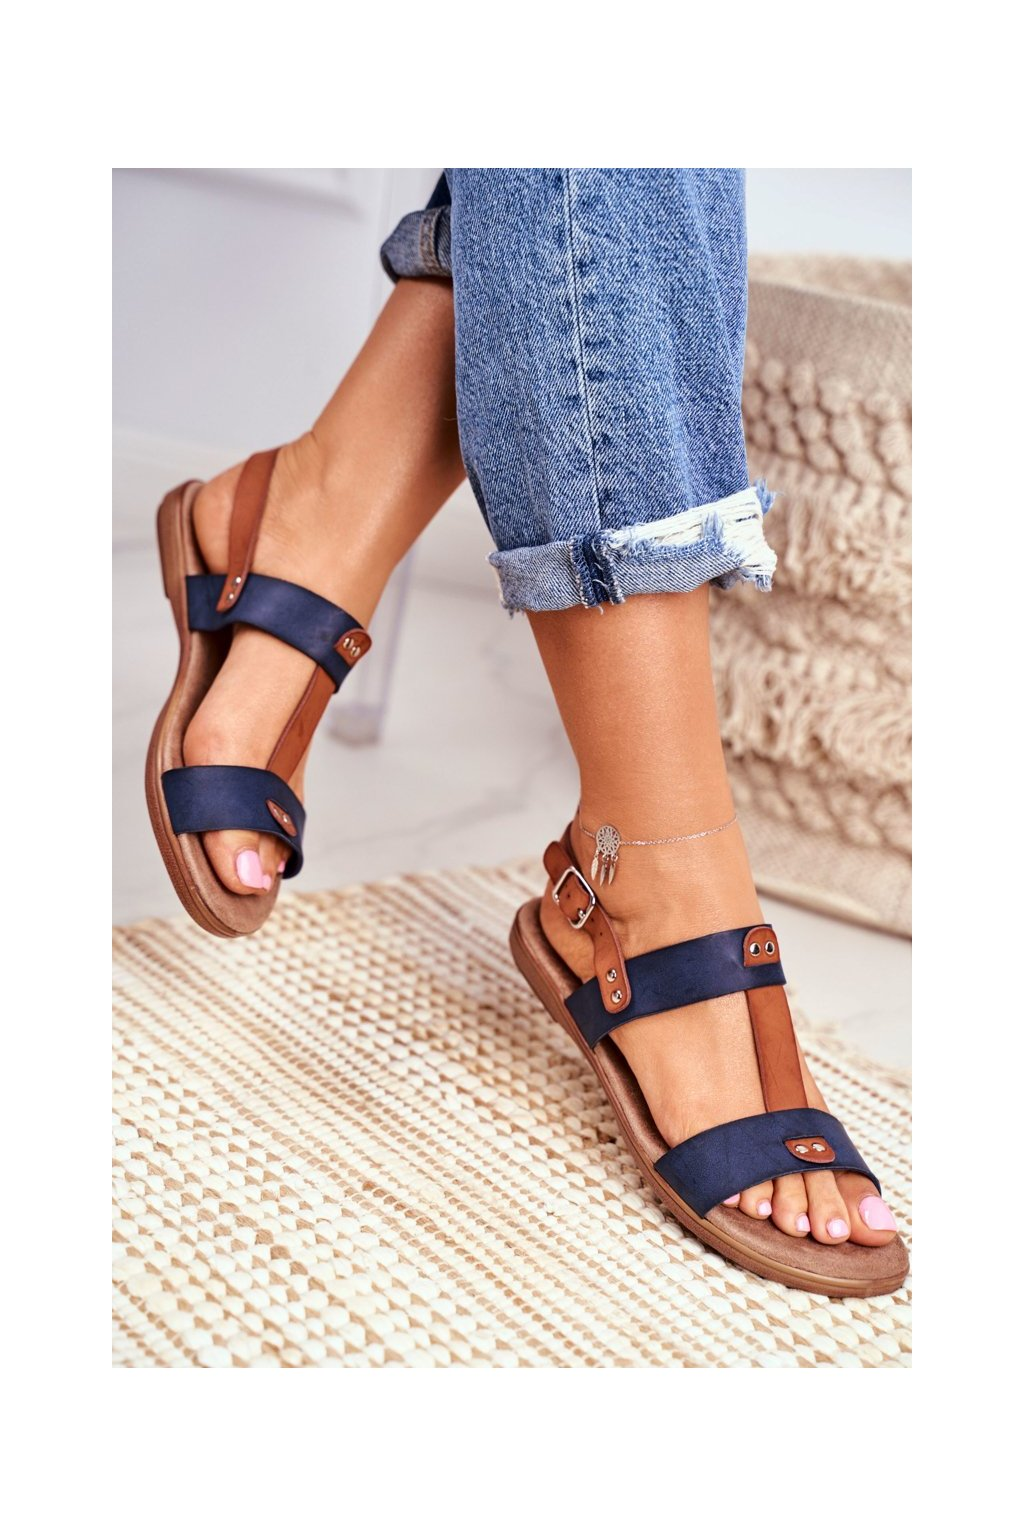 Dámske sandále s plochou podrážkou farba modrá kód obuvi 8SD35-0307 BLUE